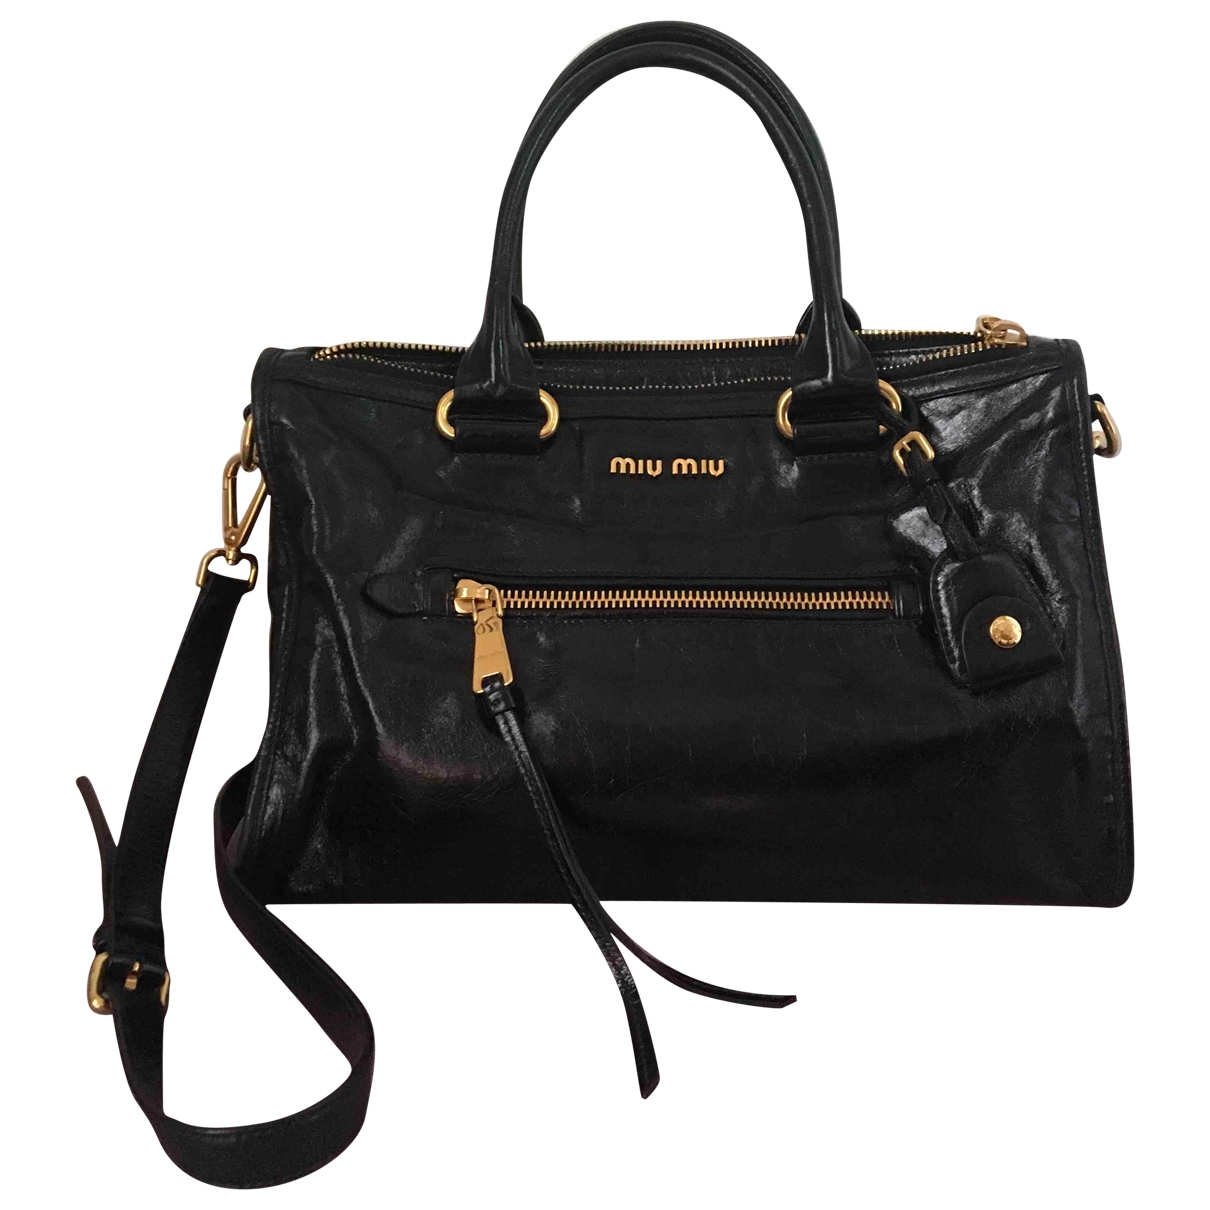 Miu Miu \N Black Leather handbag for Women \N